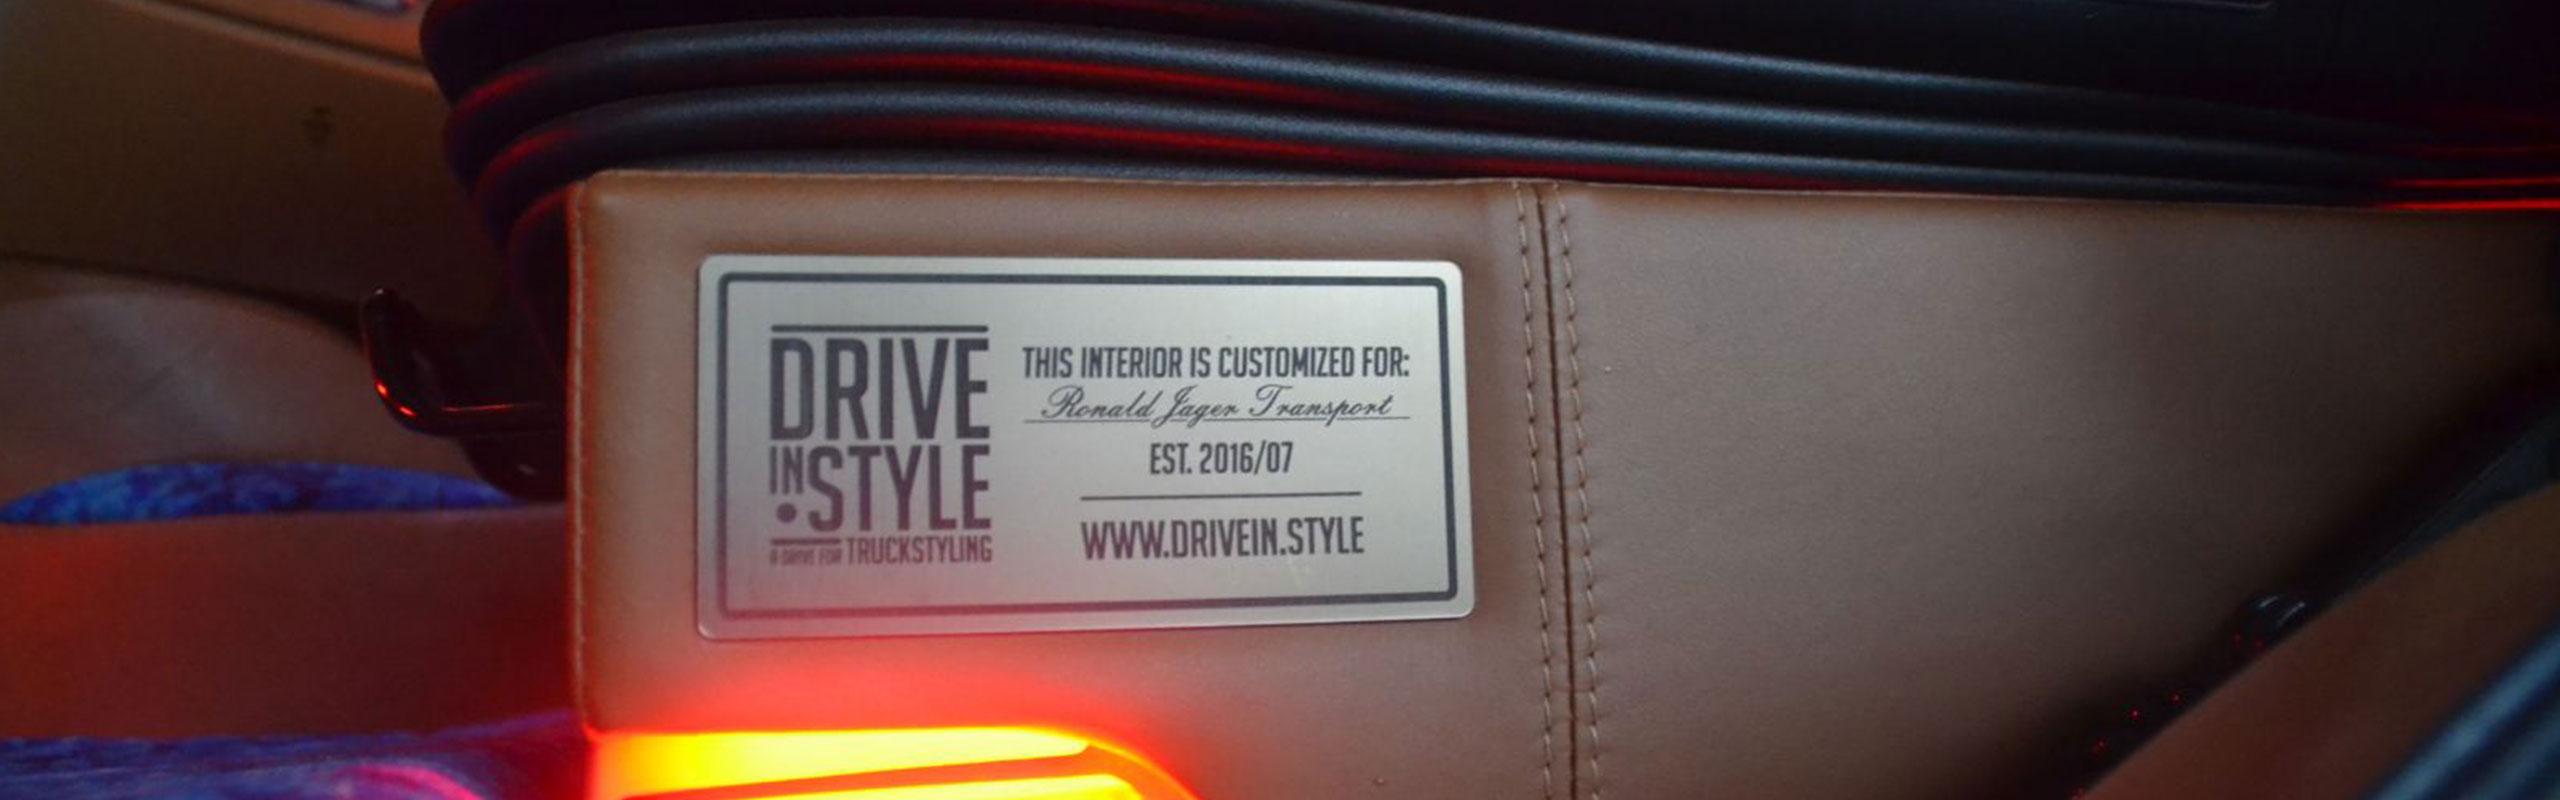 drive-in-style_custom-interior-header